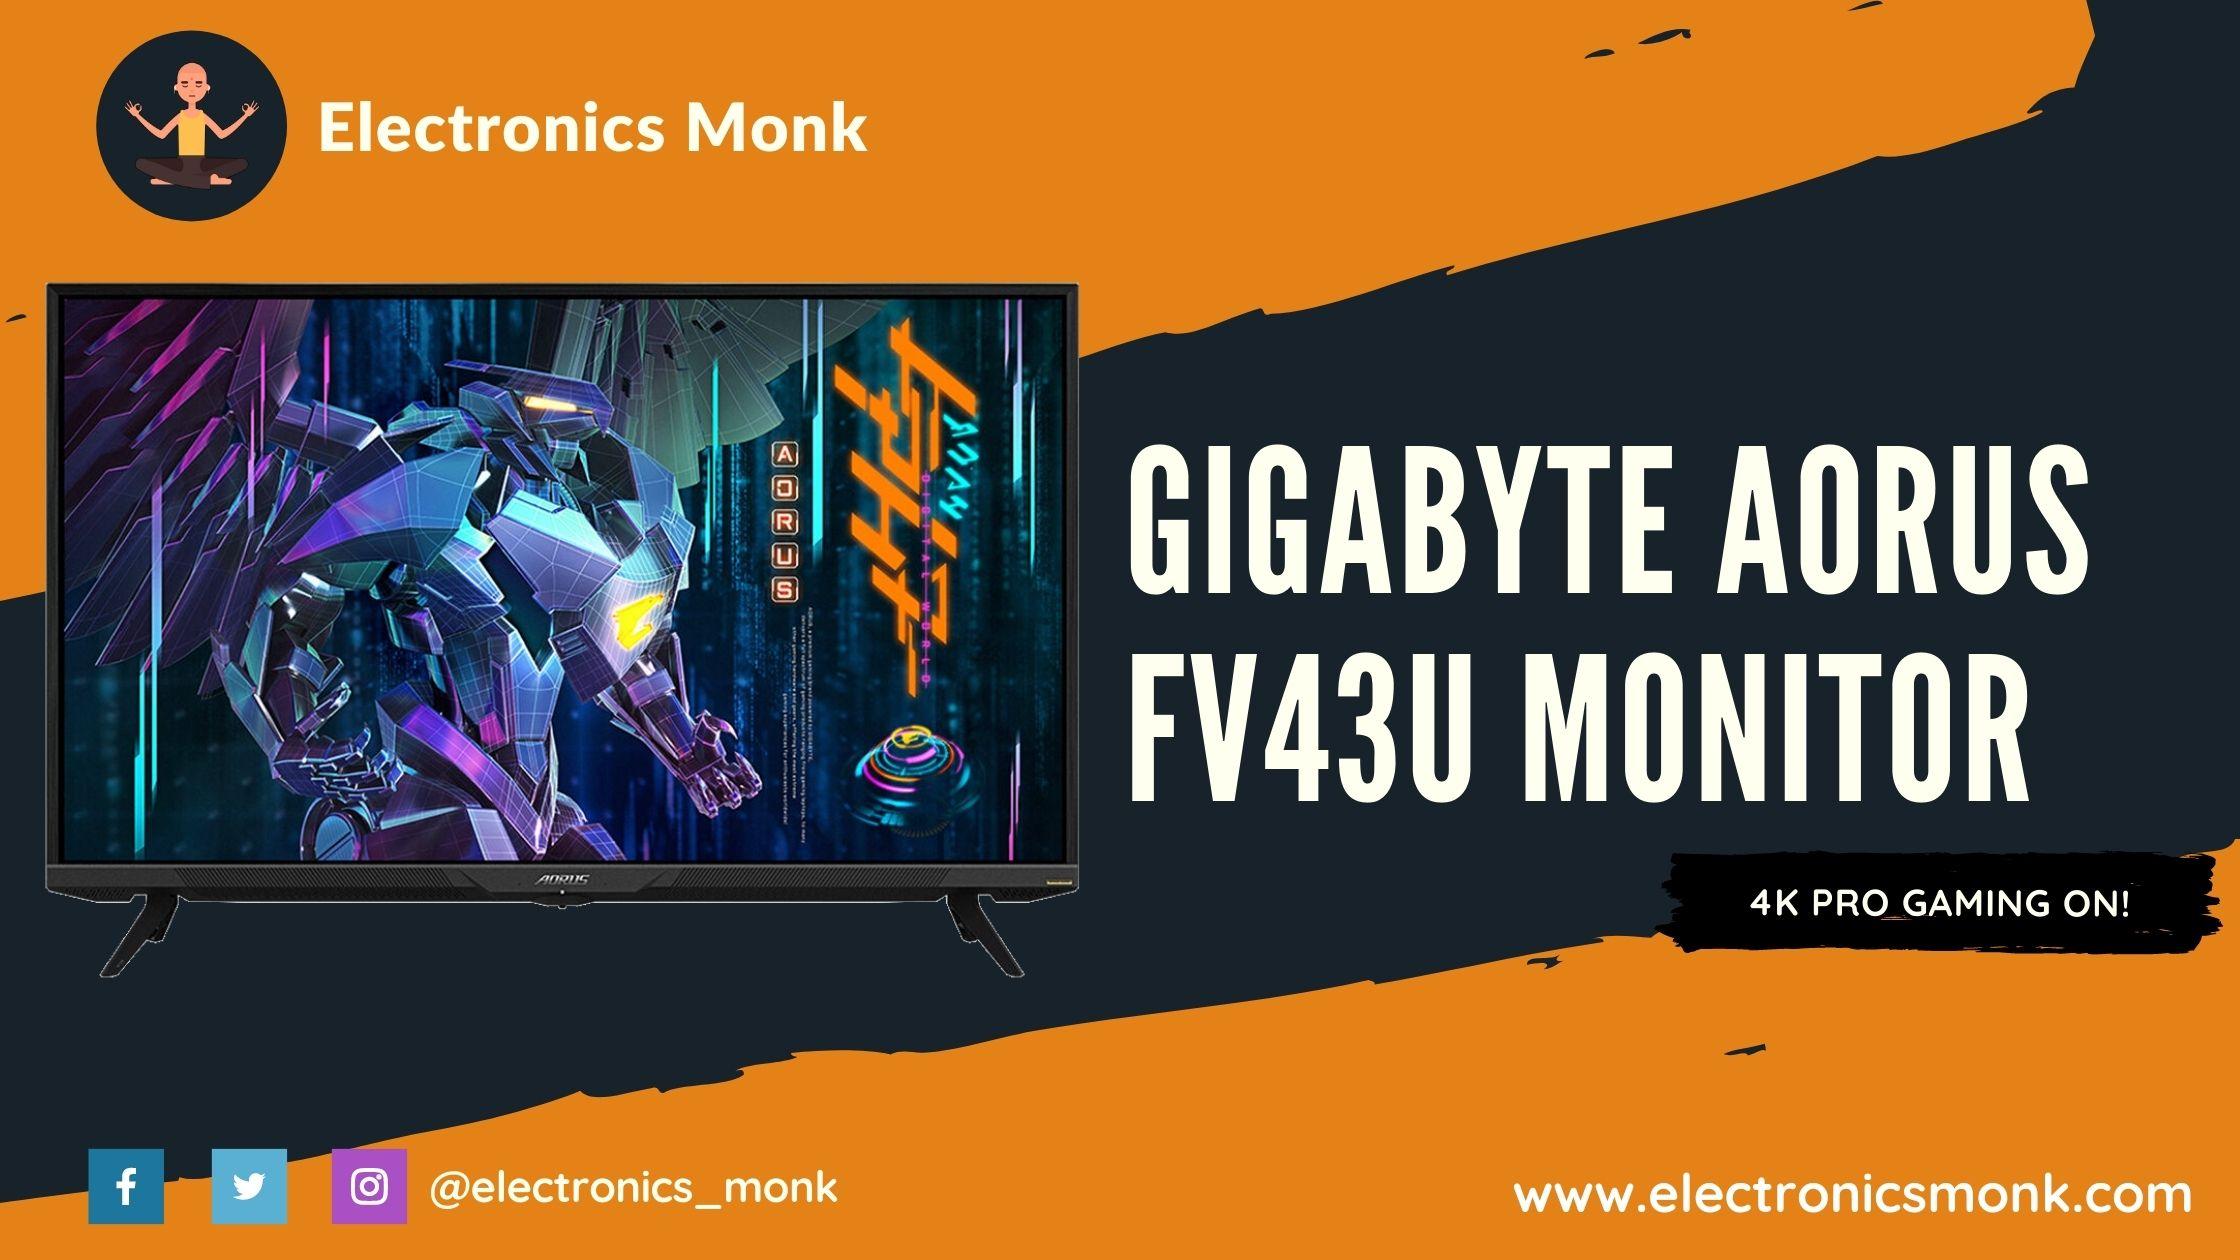 Gigabyte Aorus Fv43u Gaming Monitor Review